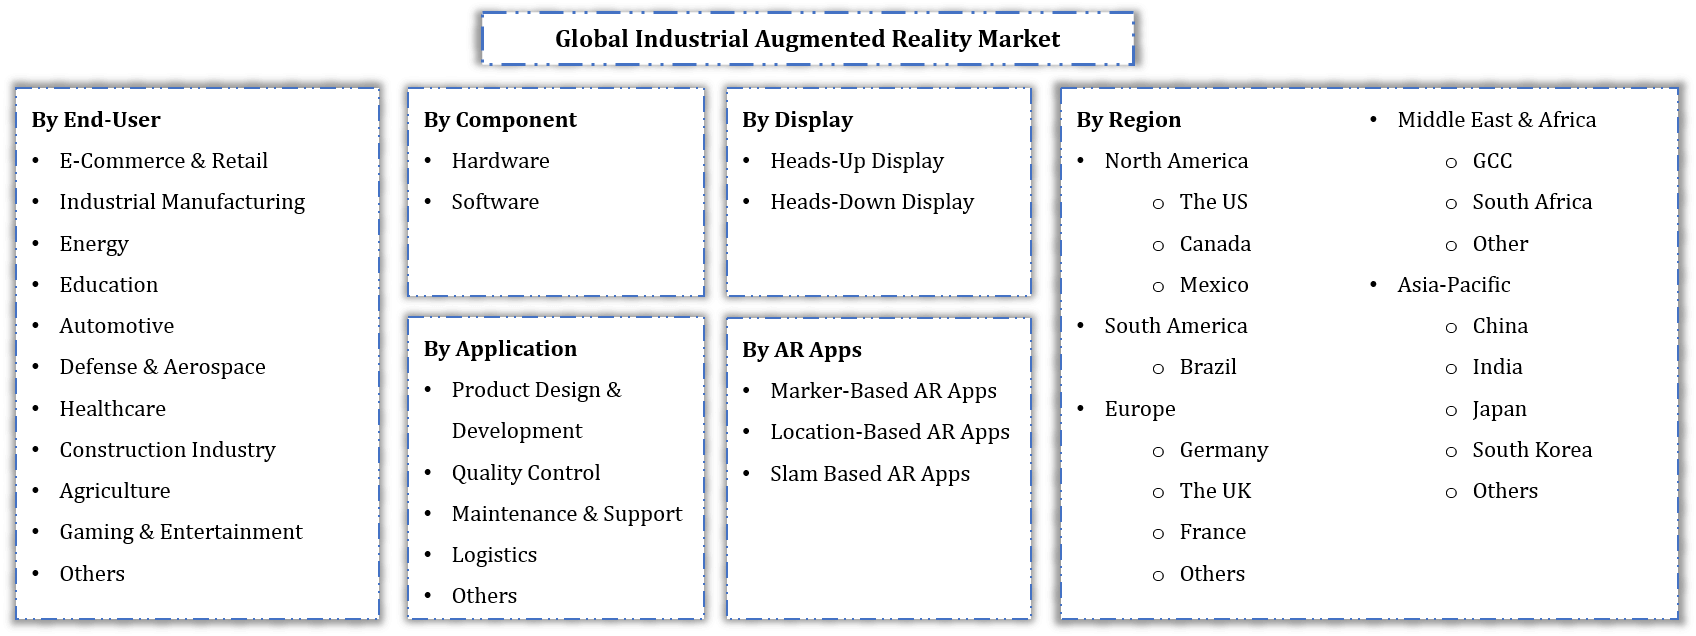 Global Industrial Augmented Reality Market Segmentation